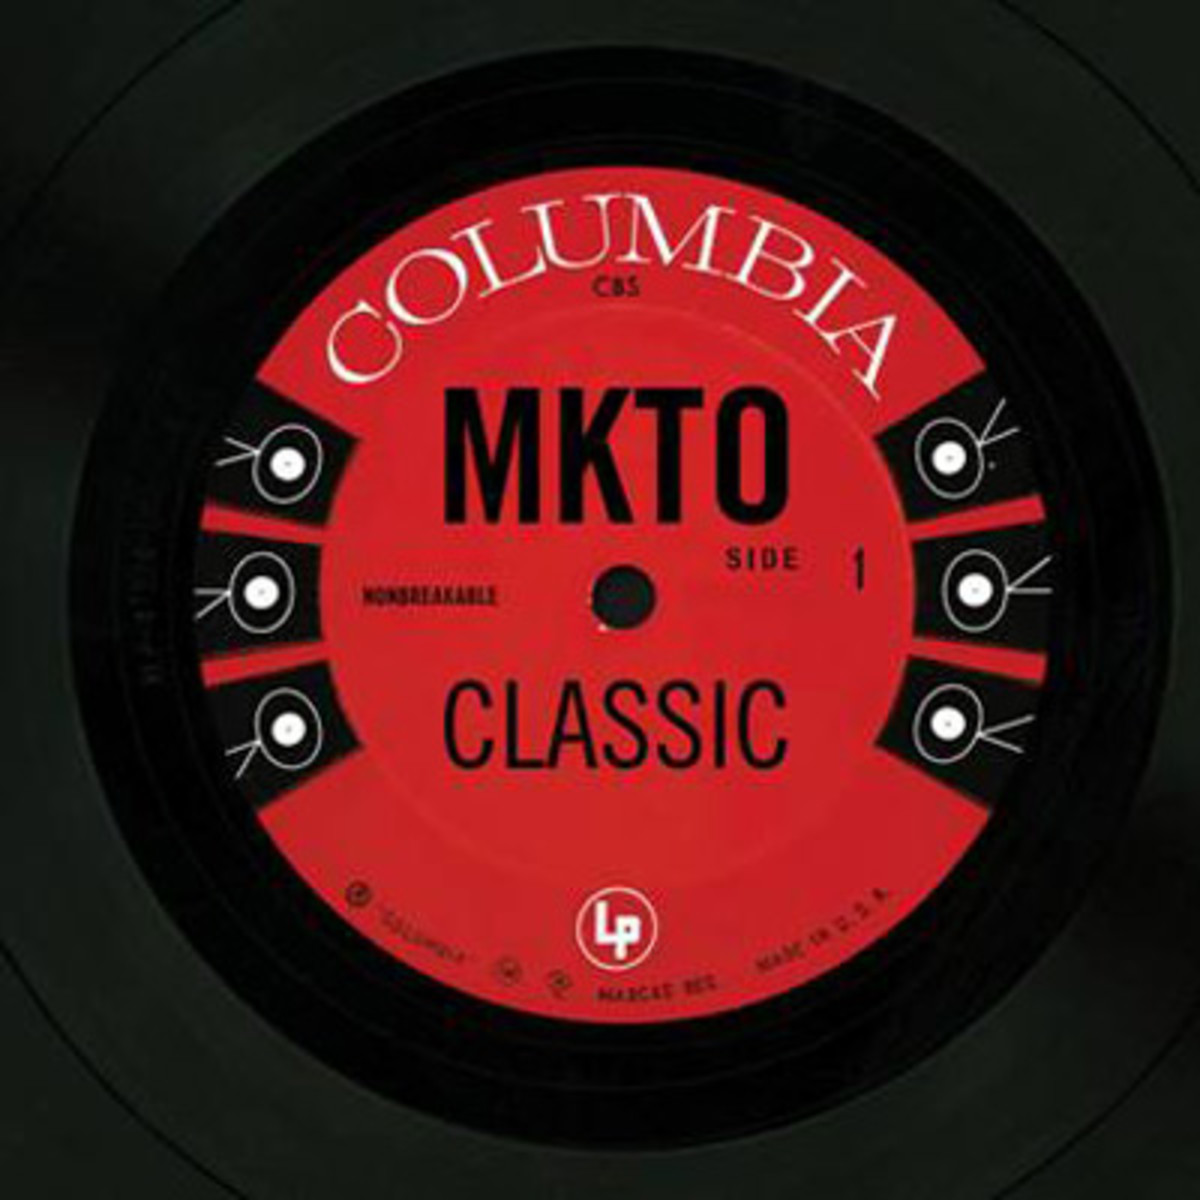 mkto-classic.jpg